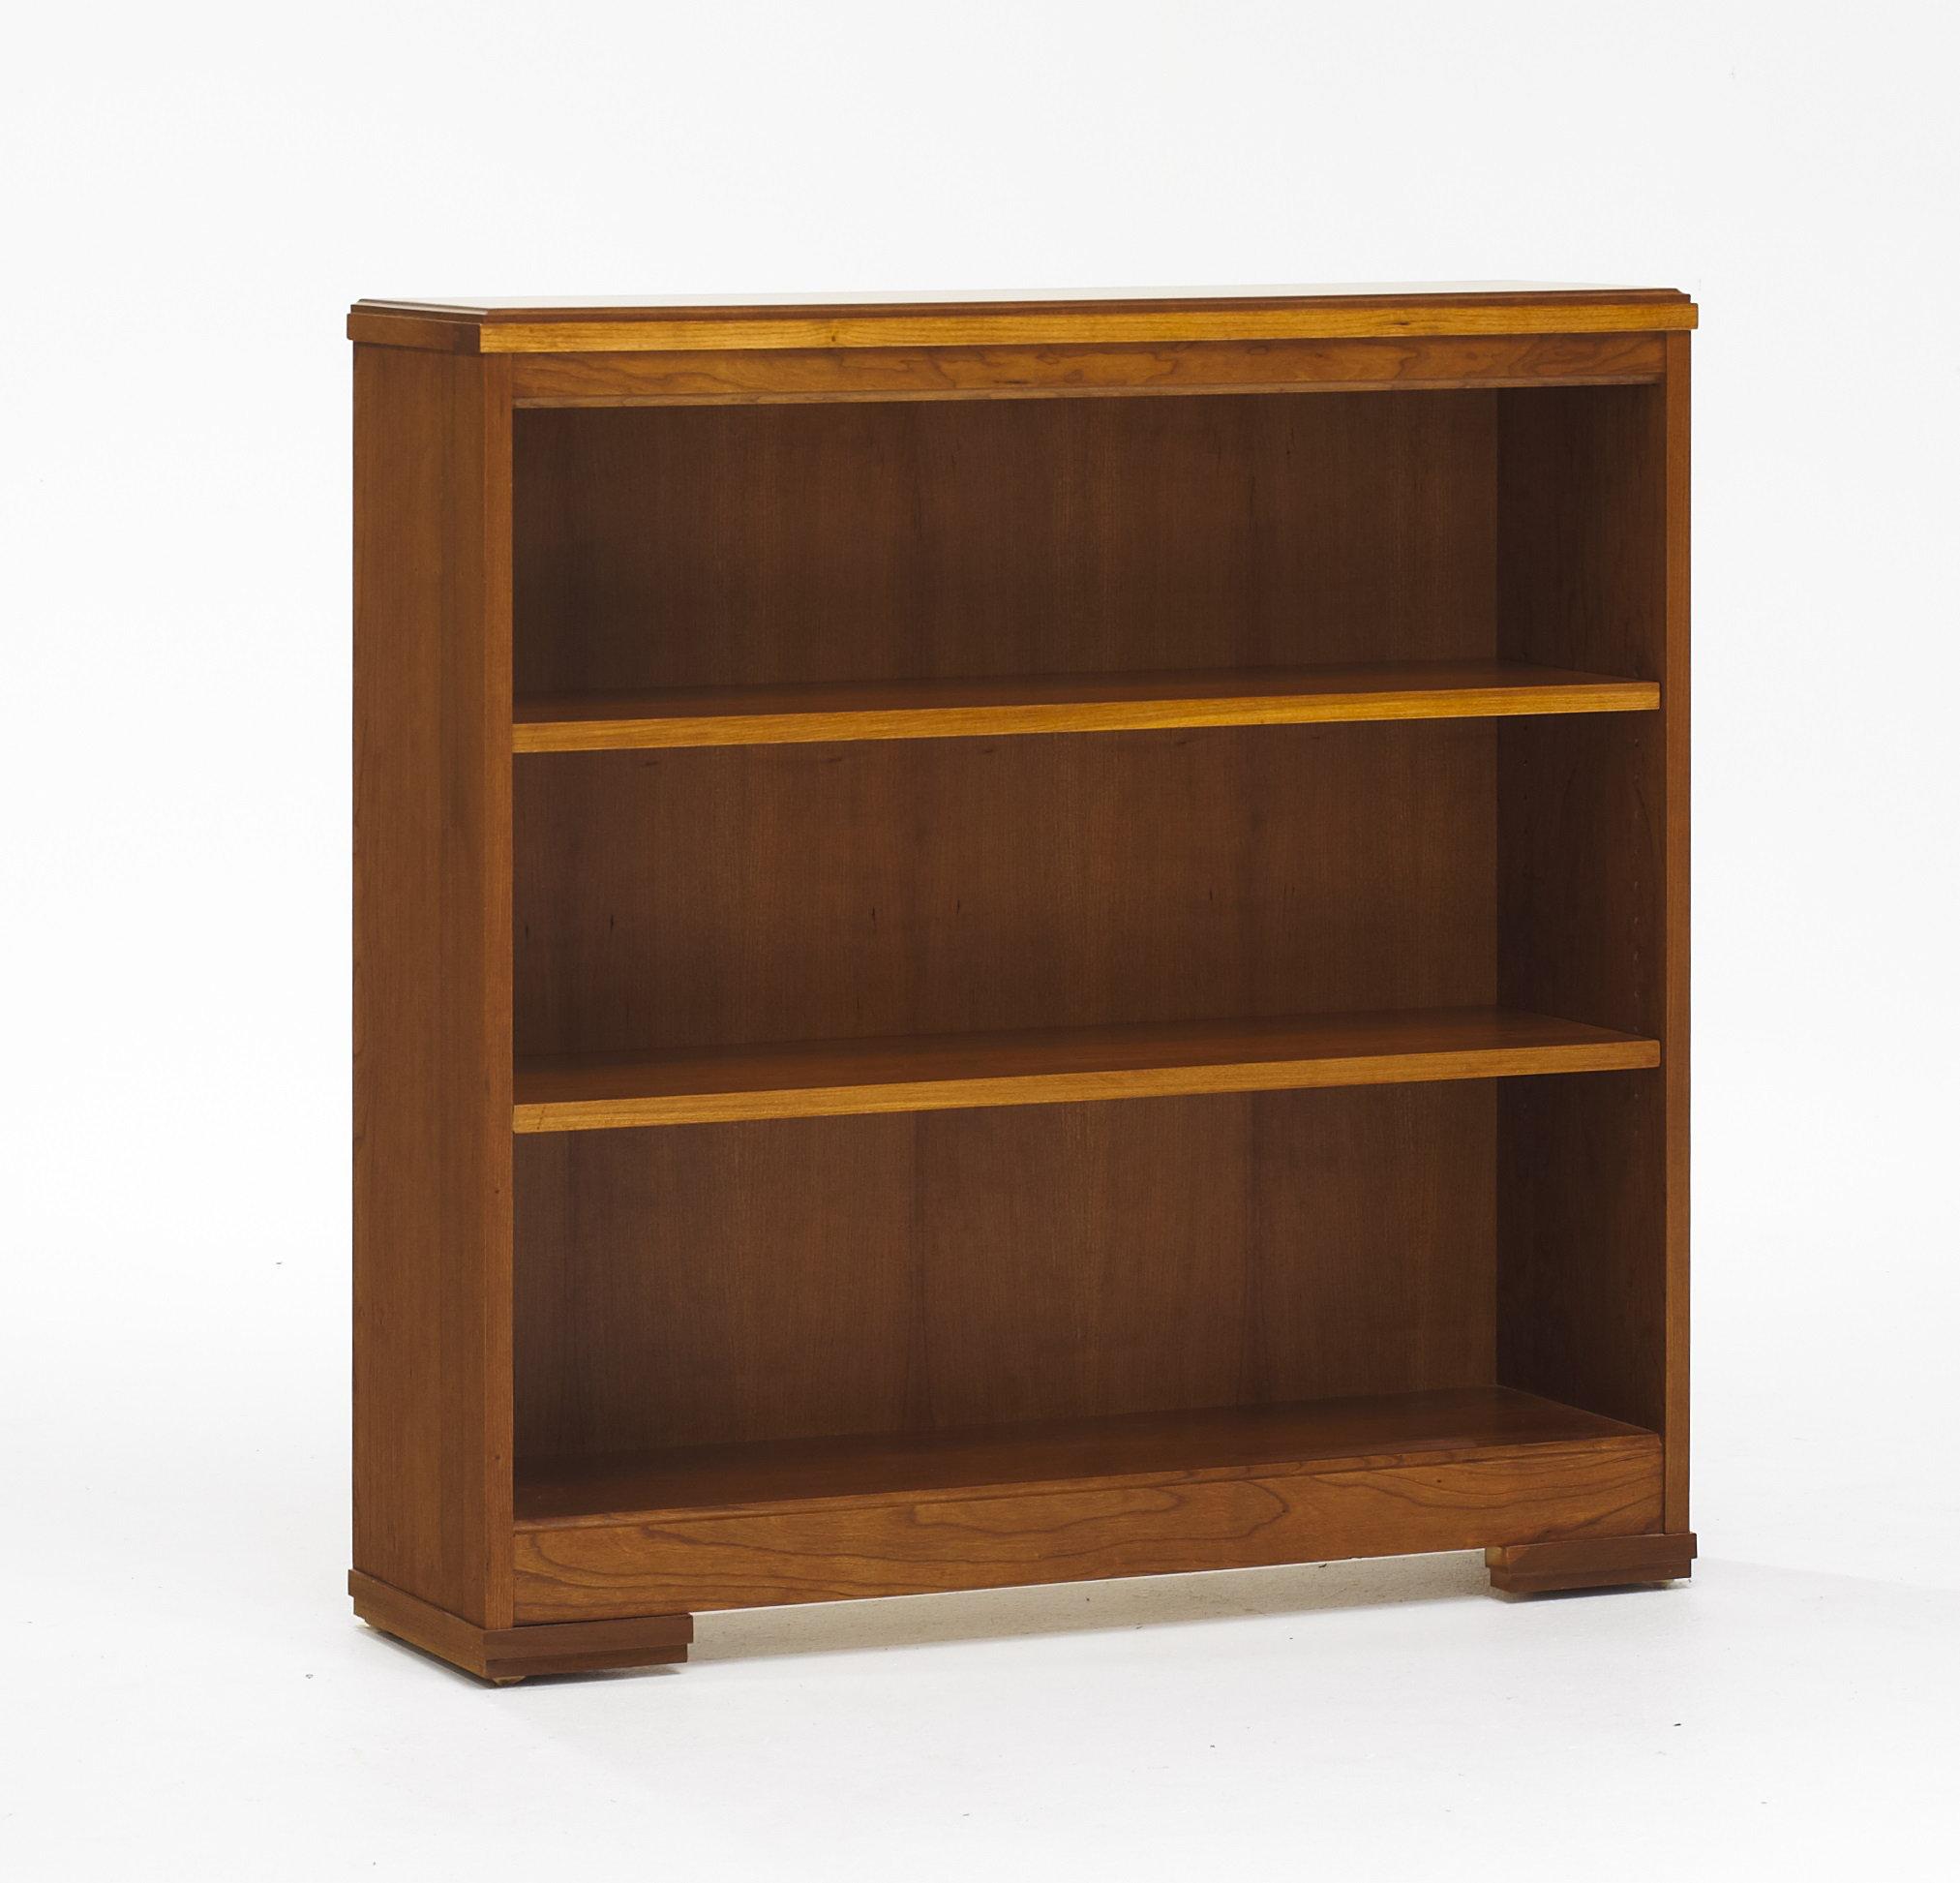 Hale Bookcases Traditonal Series Standard Bookcase Wayfair